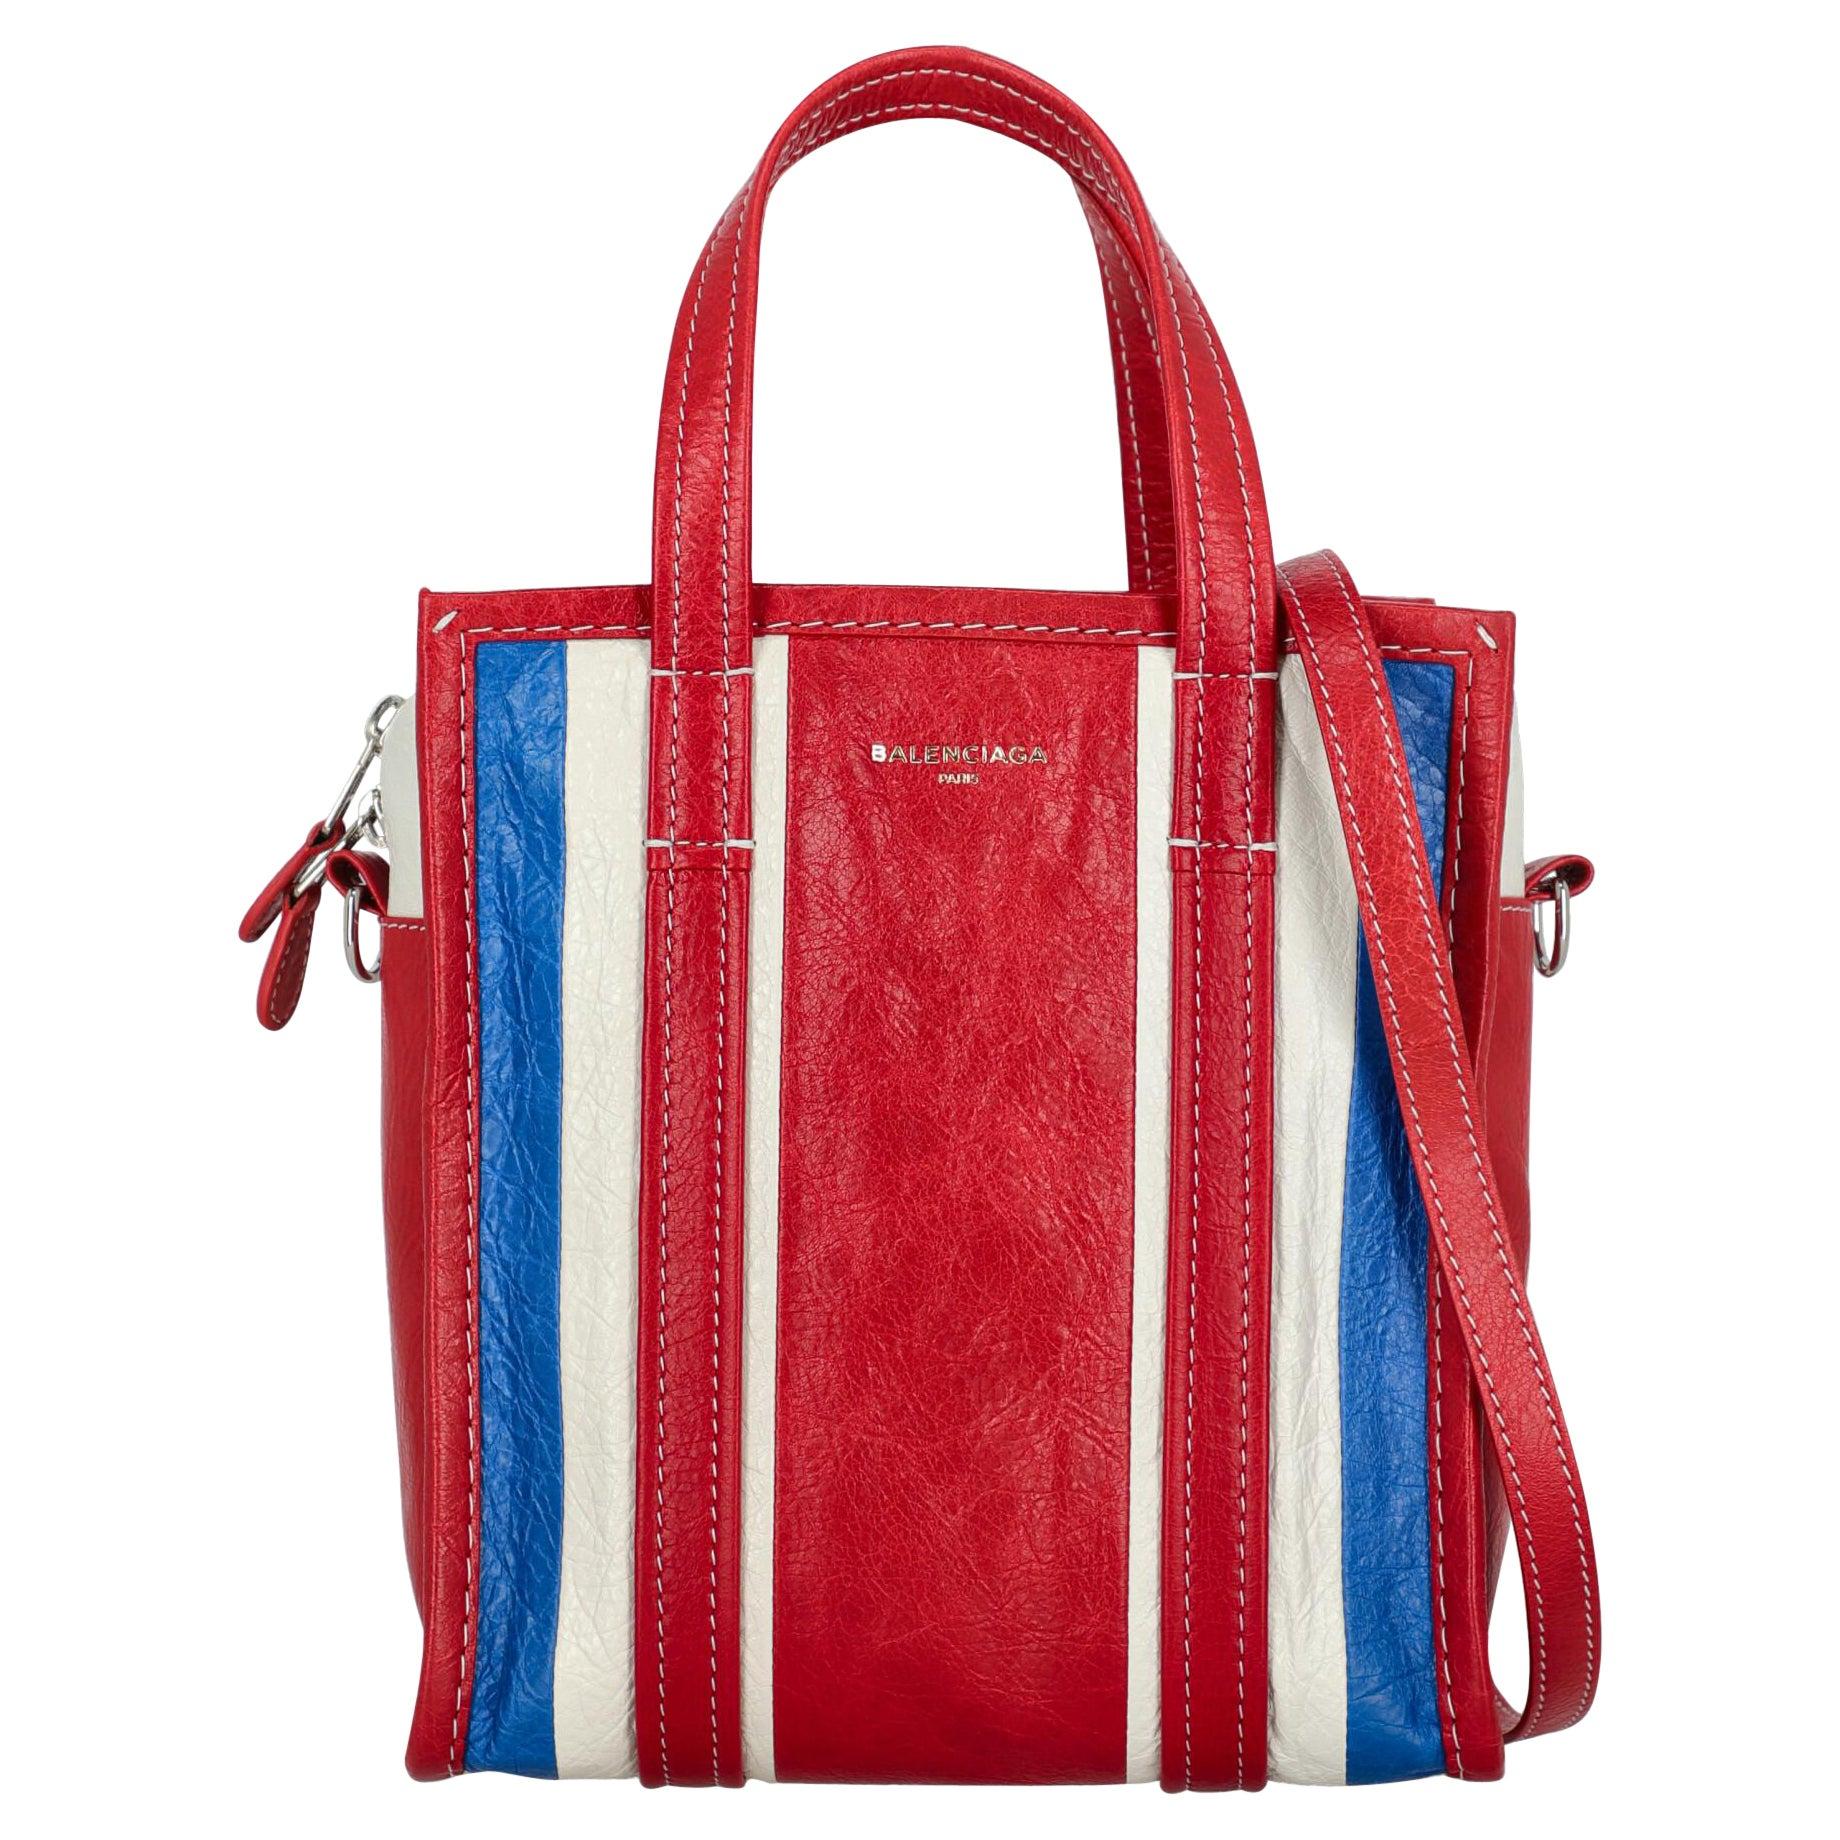 Balenciaga Women Shoulder bags Bazaar Navy, Red, White Leather